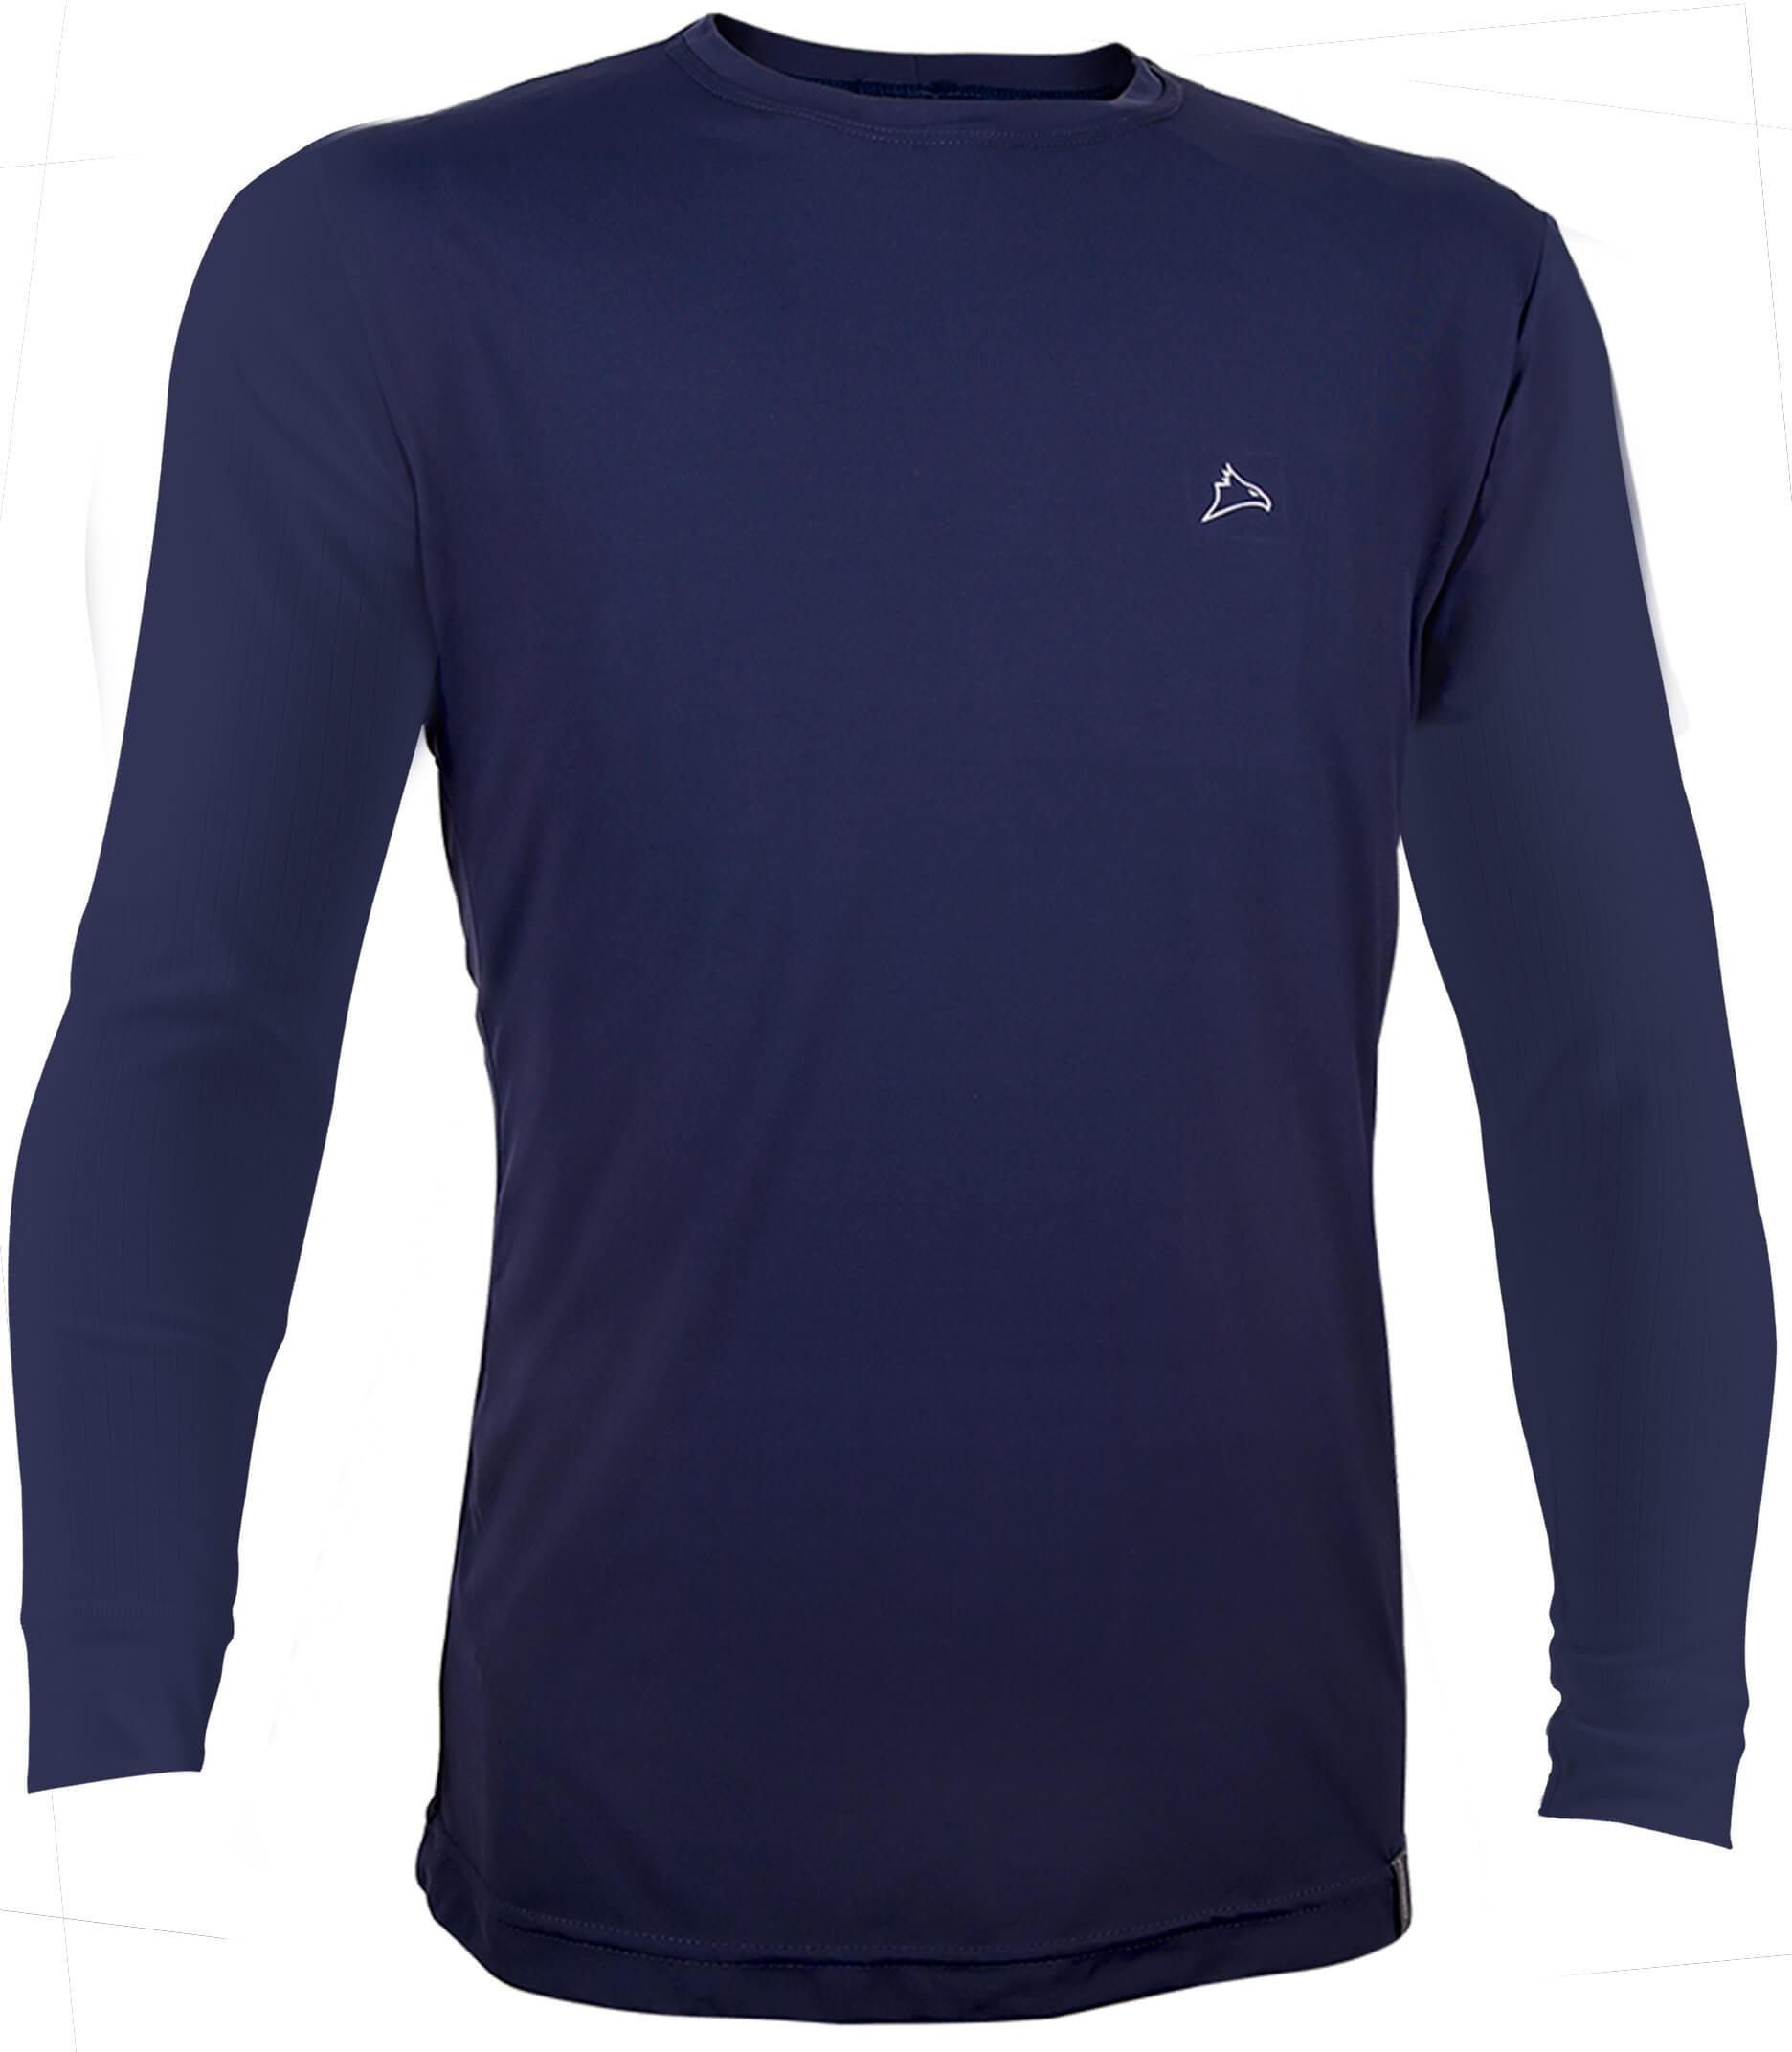 Camiseta ML  Dry Cool UPF50+ Azul Marinho - CONQUISTA